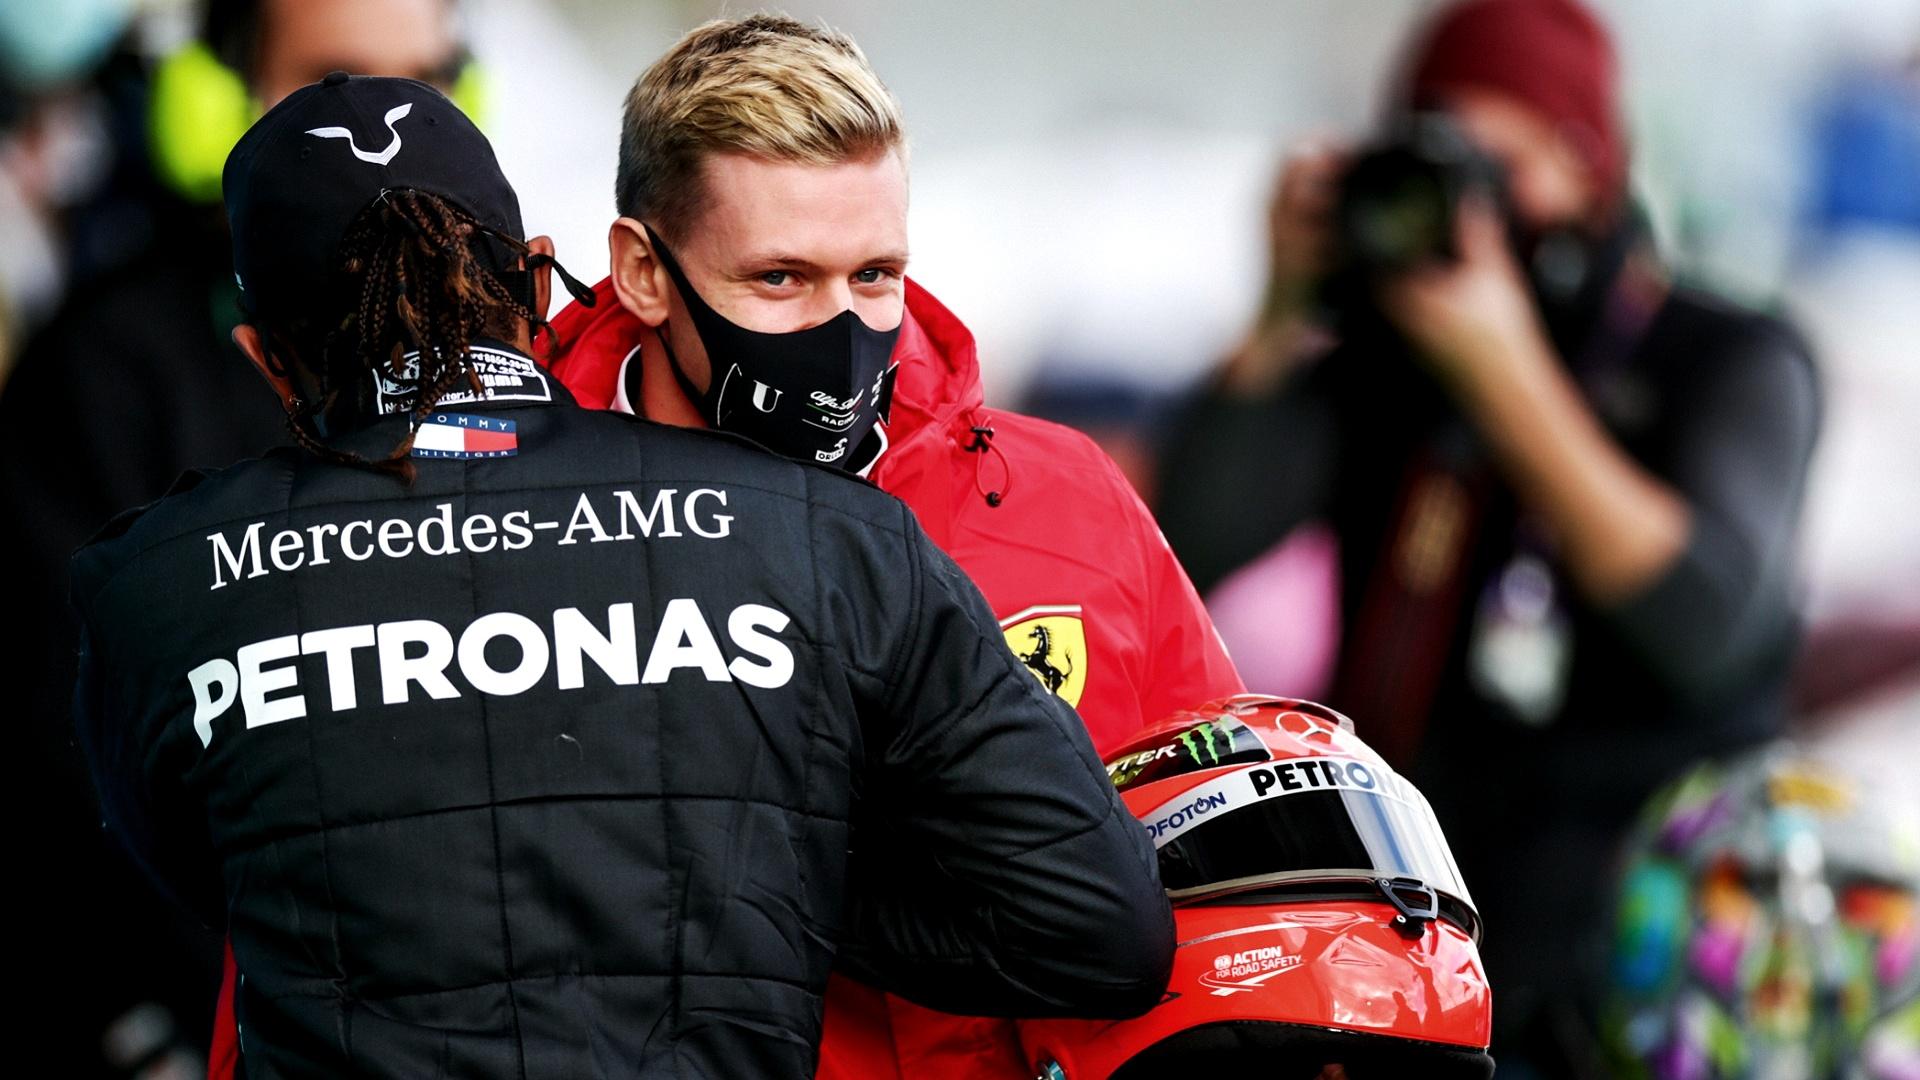 2021-01-17 Schumacher Mick Formula 1 F1